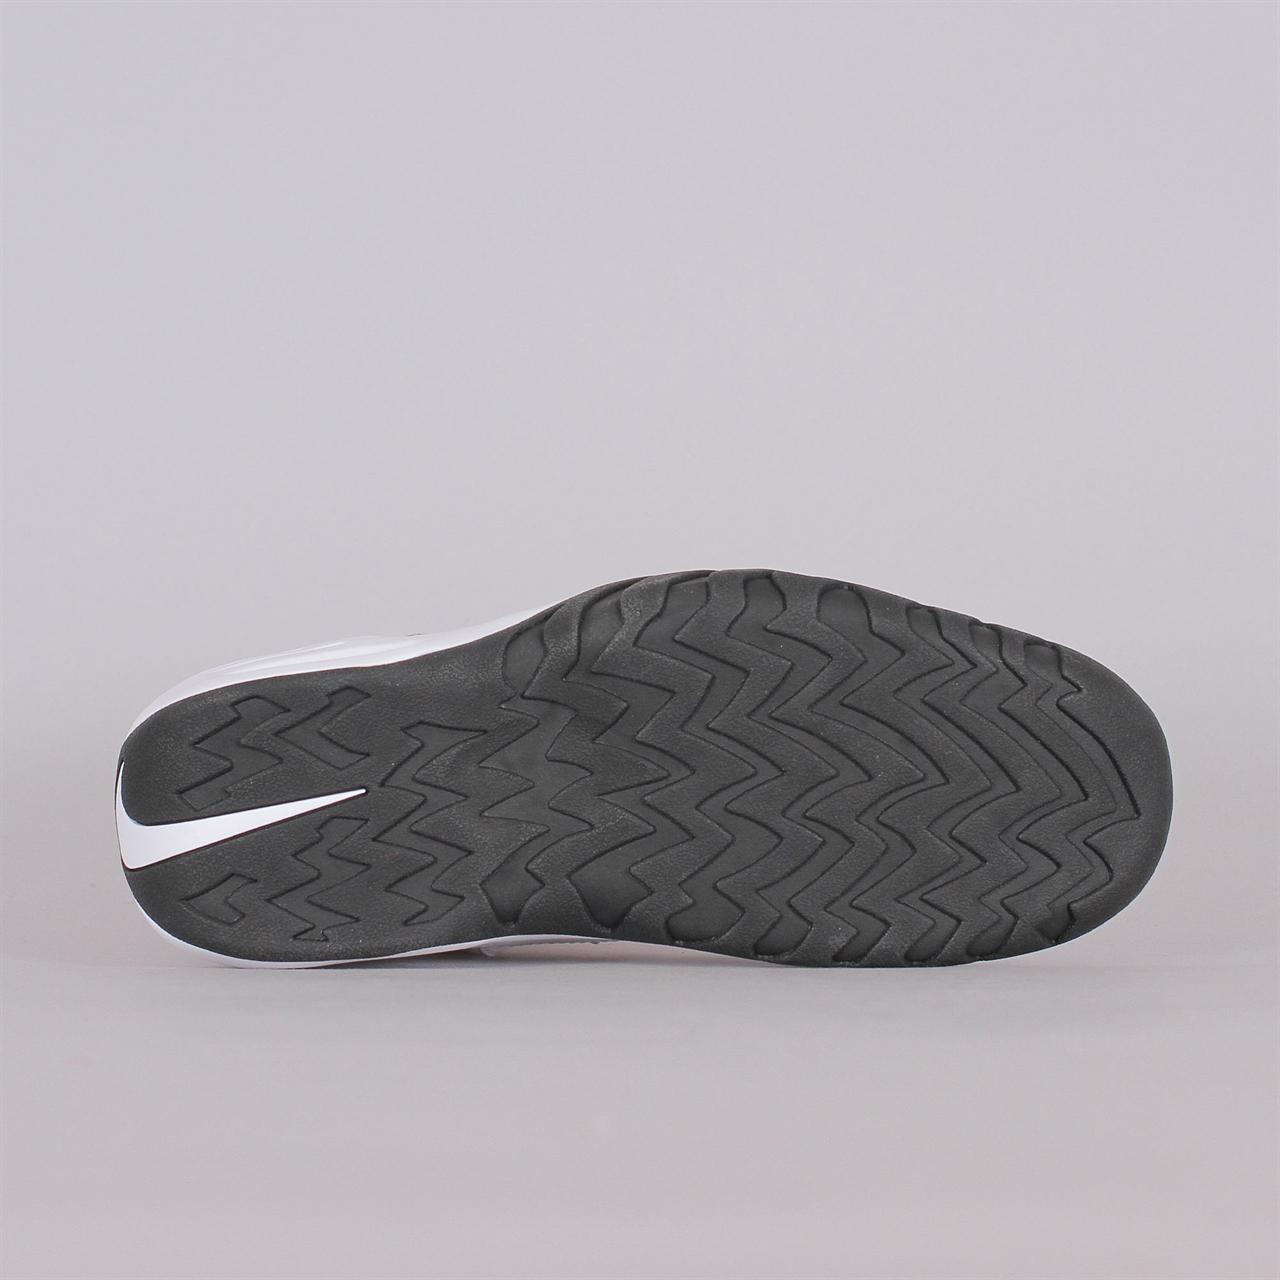 quality design 4ca5d d2b4f Nike SportswearNike Air Shake Ndestrukt (880869-100). 1